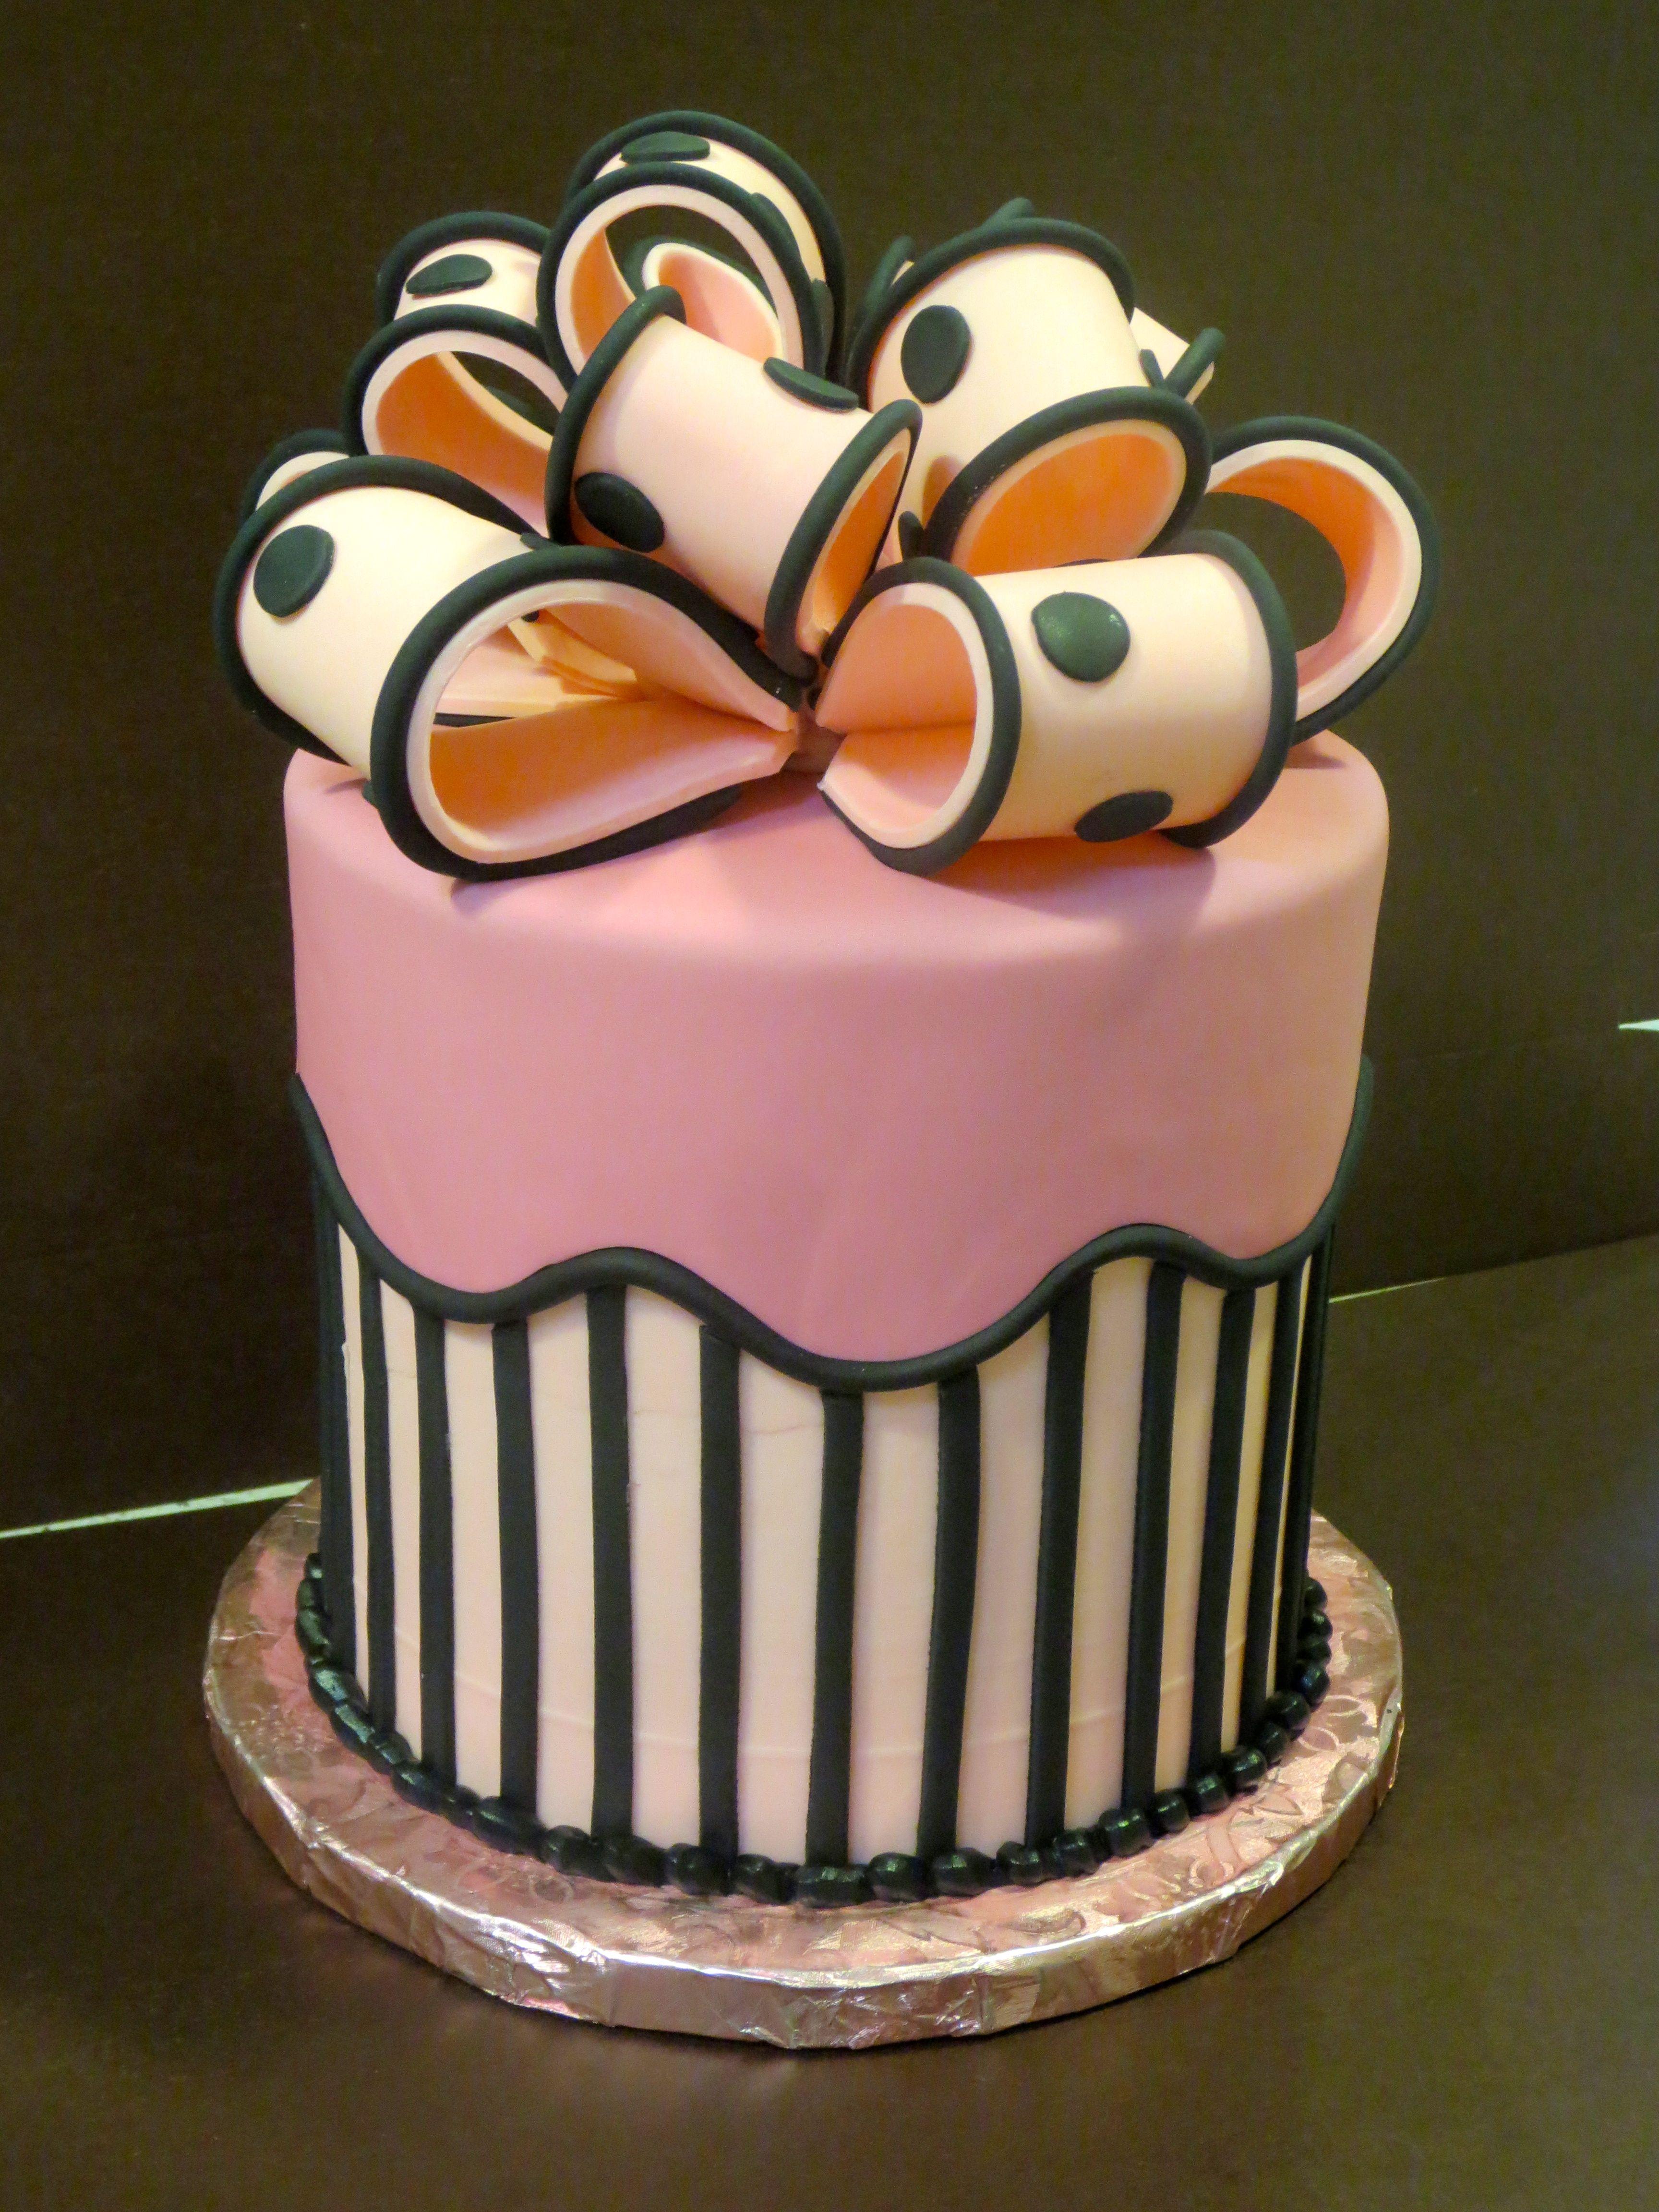 Buzz Lightyear Cake And Elegant Birthday Cake Pink